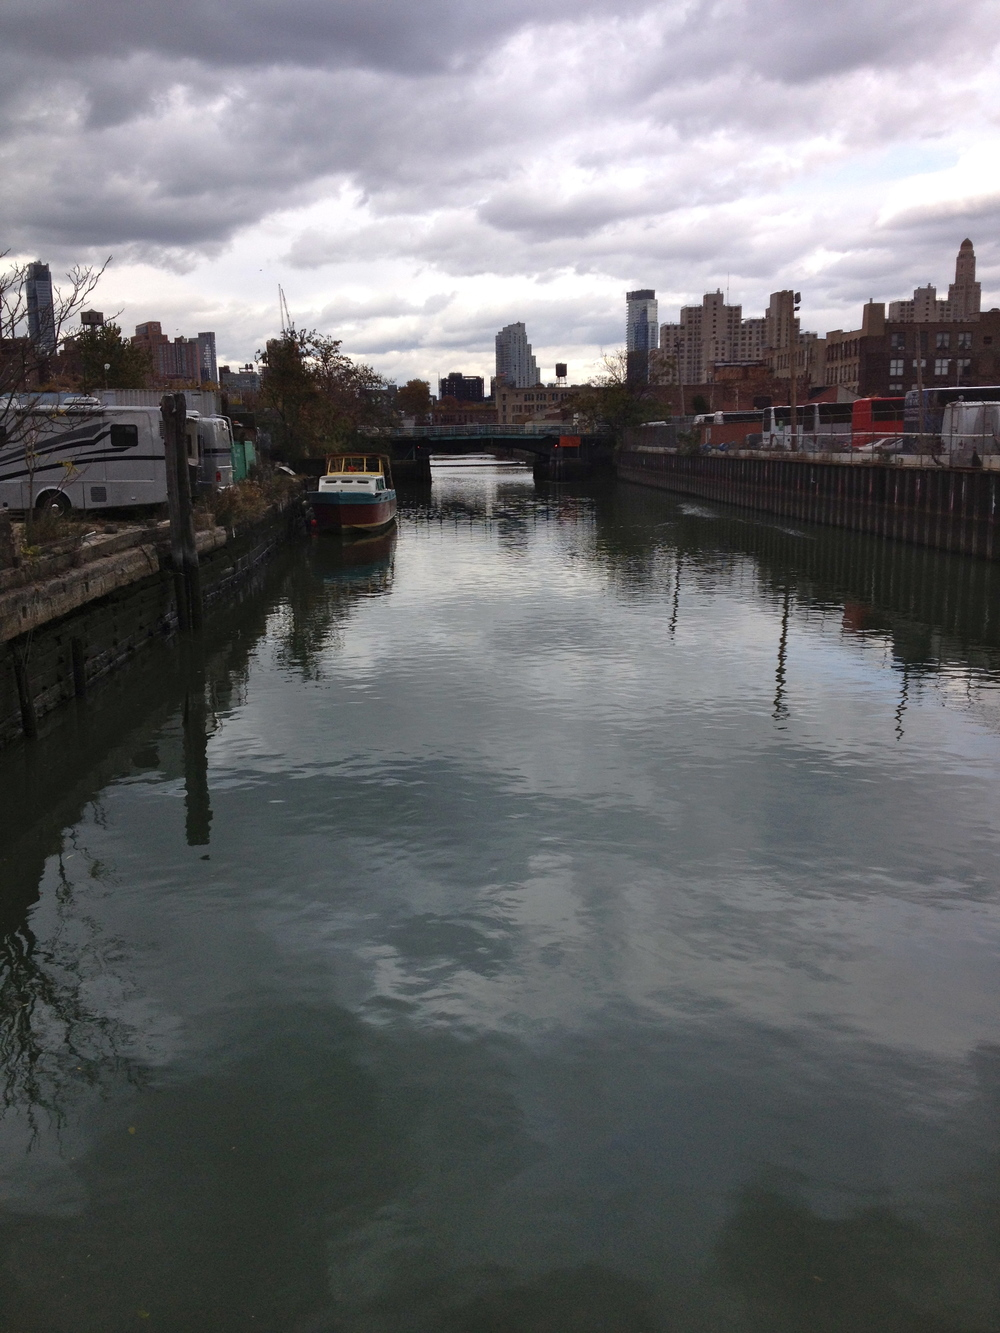 Gowanus Canal field trip - 11/7